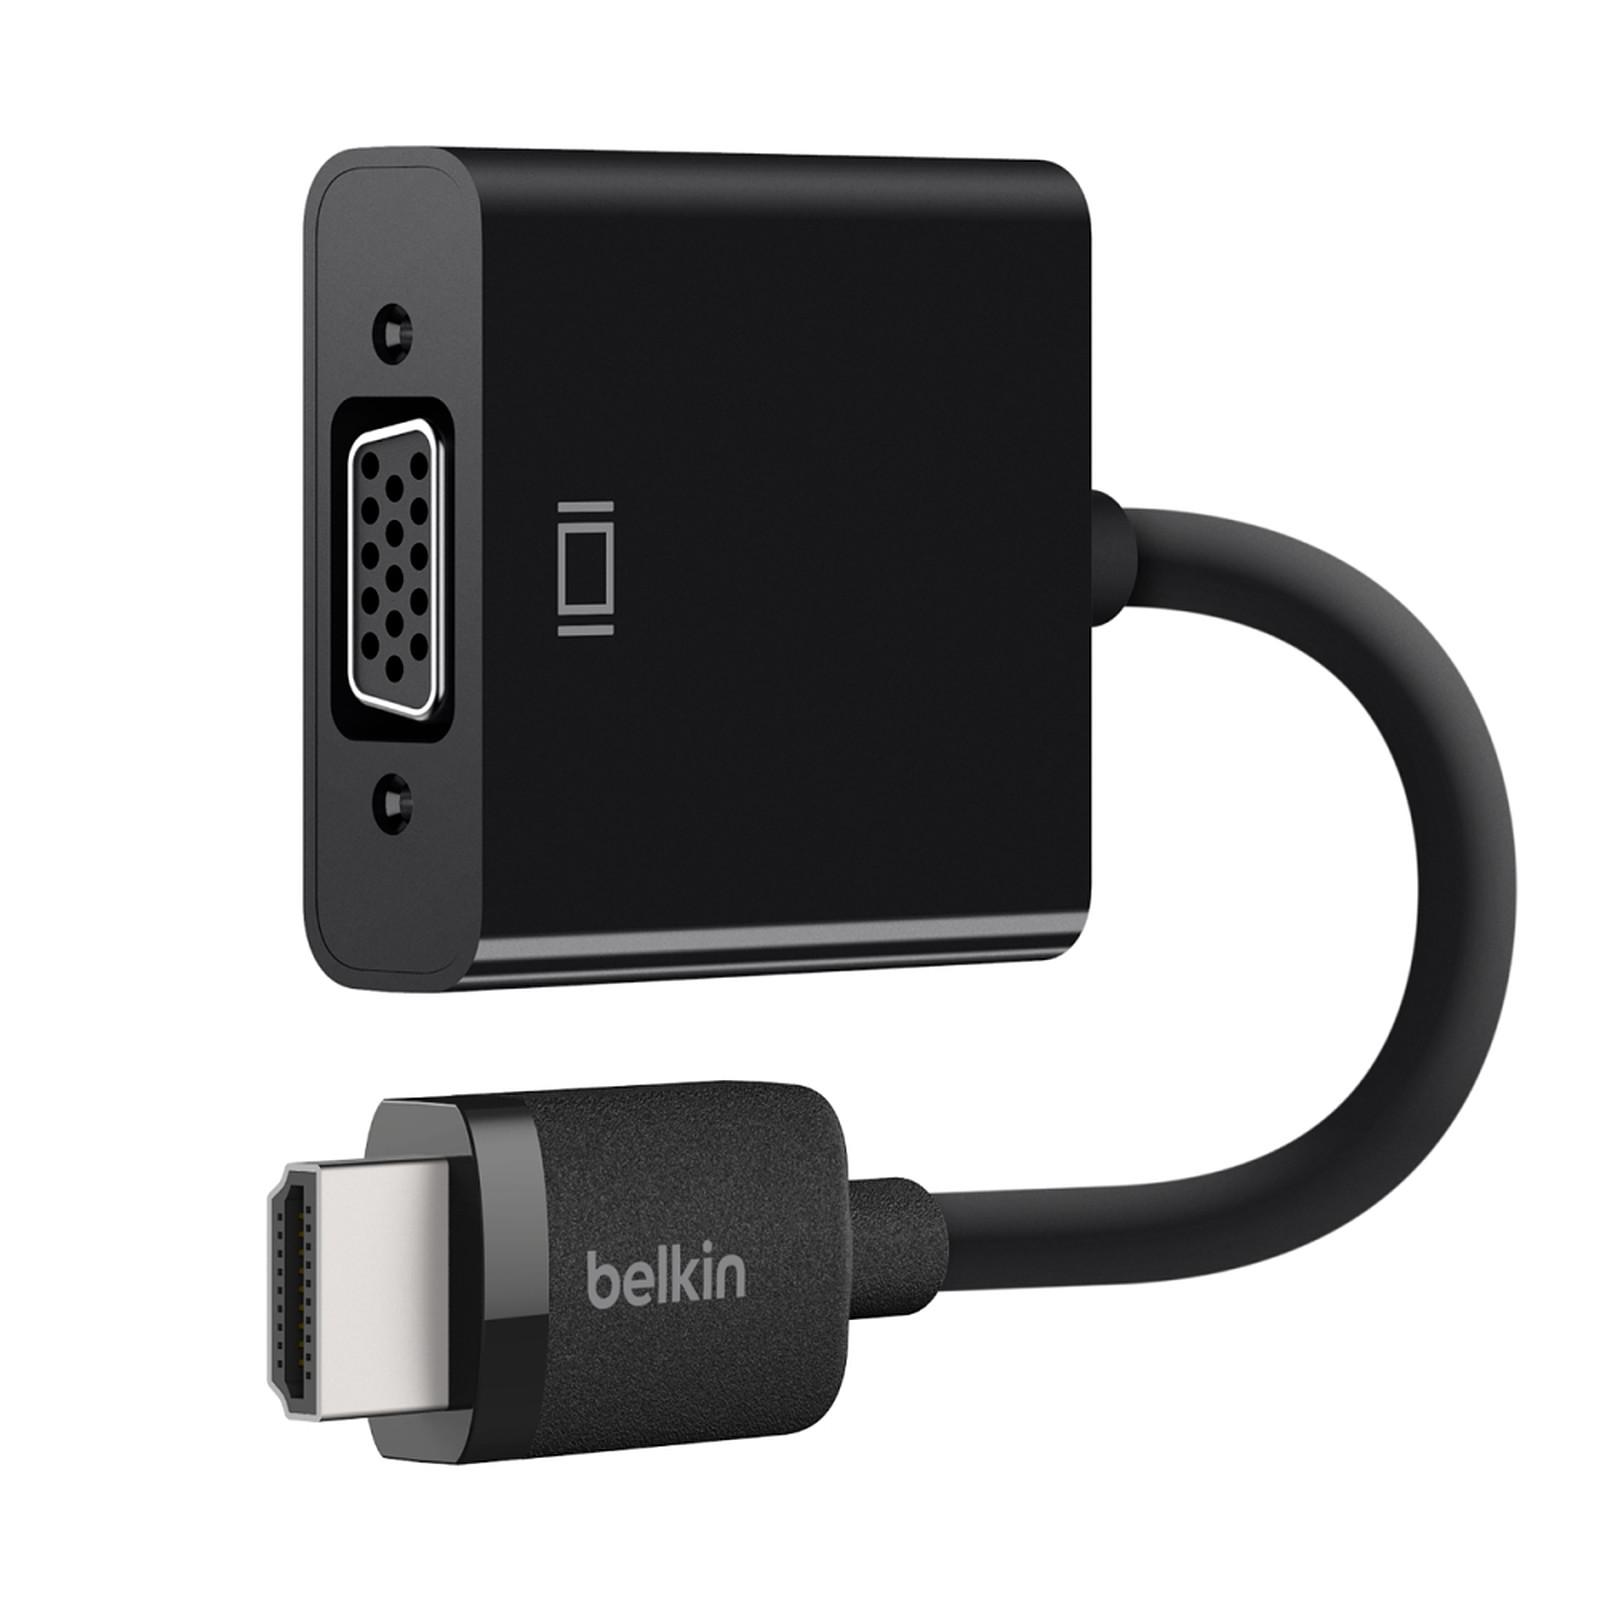 Belkin adaptateur HDMI / VGA